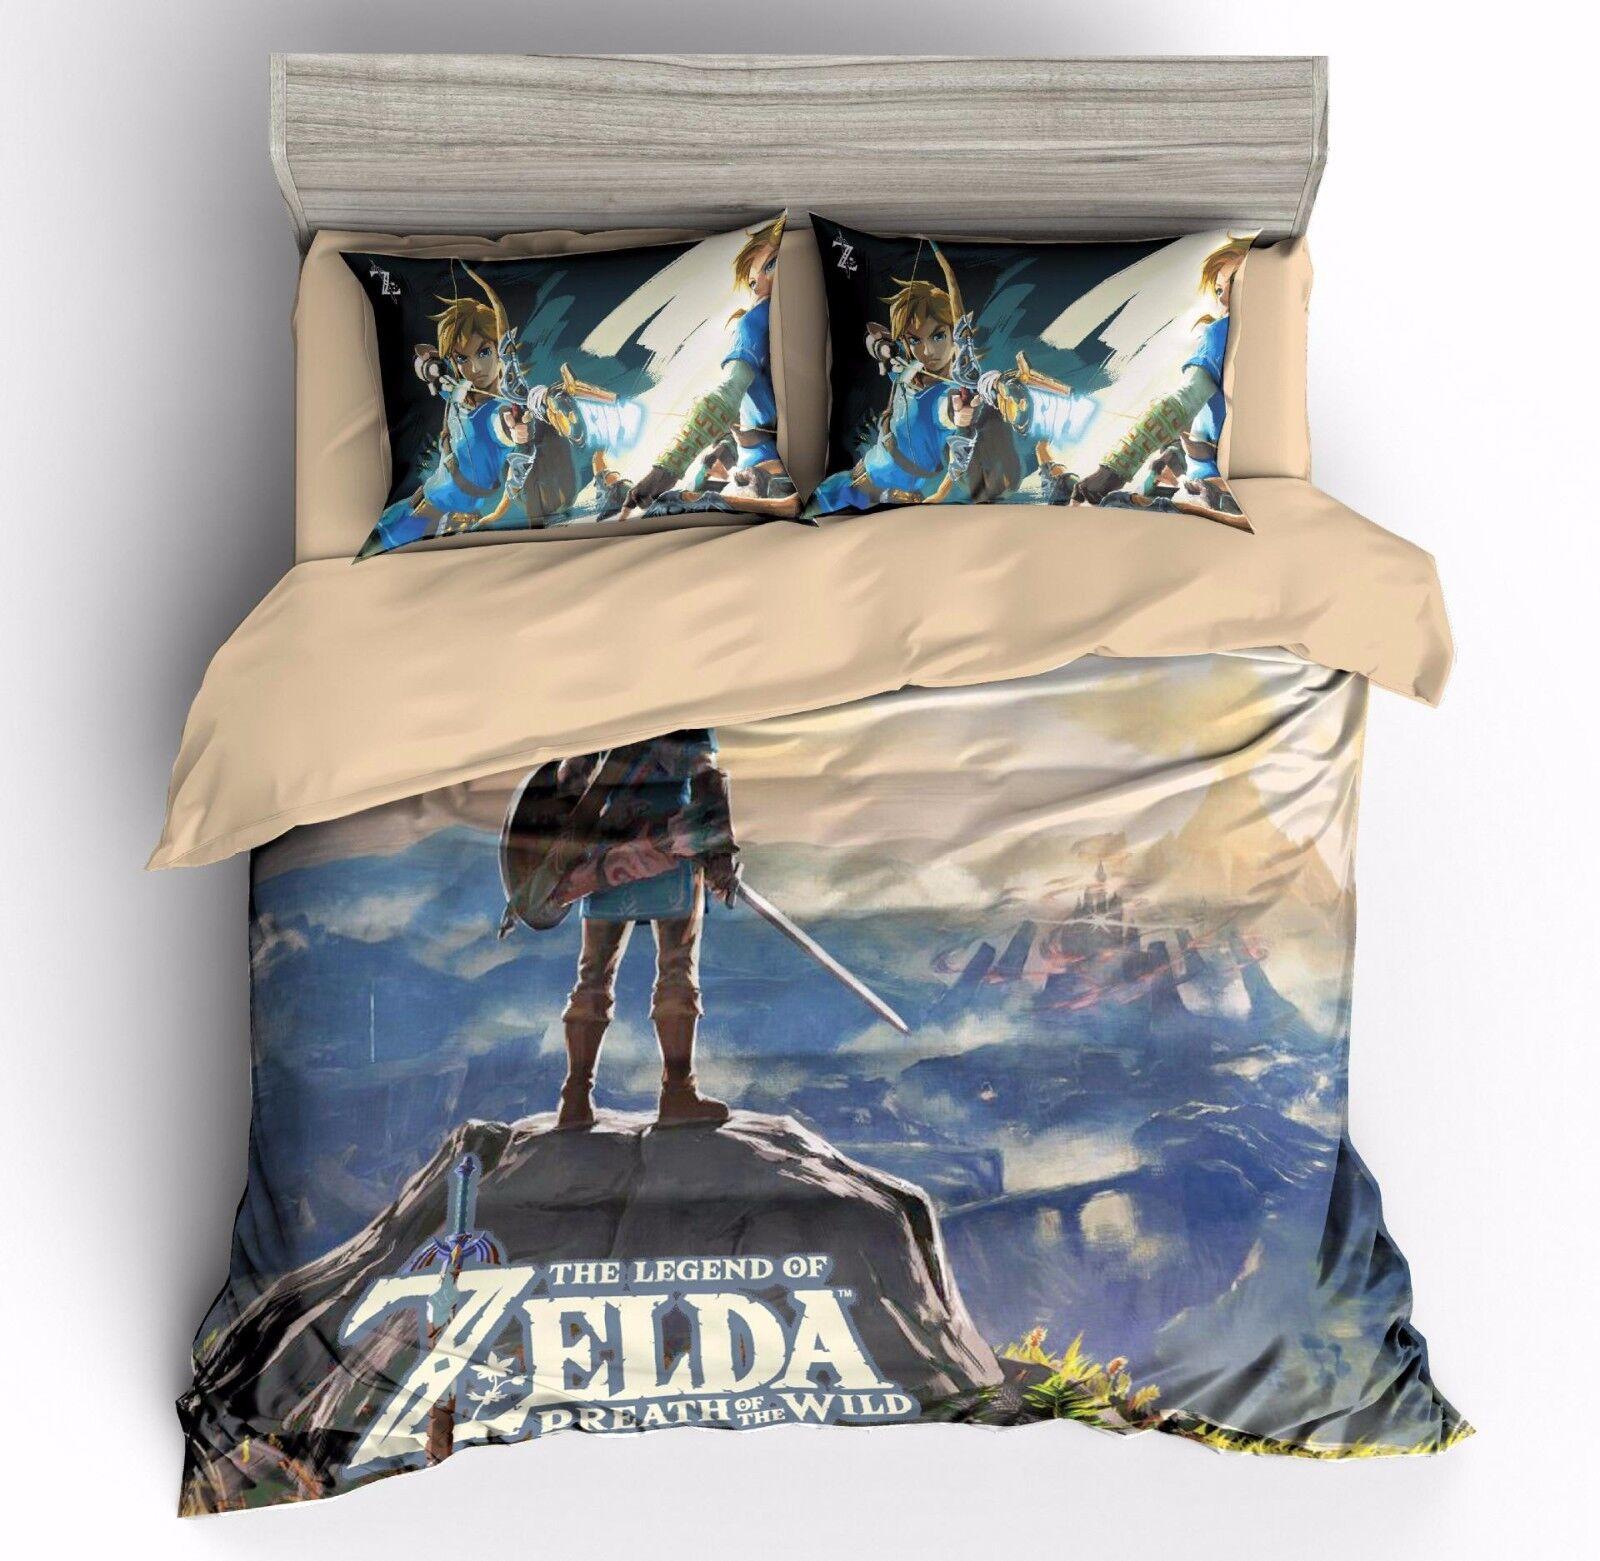 3D The Legend of Zelda Bedding Set Duvet Cover Comforter Cover Pillowcase Set